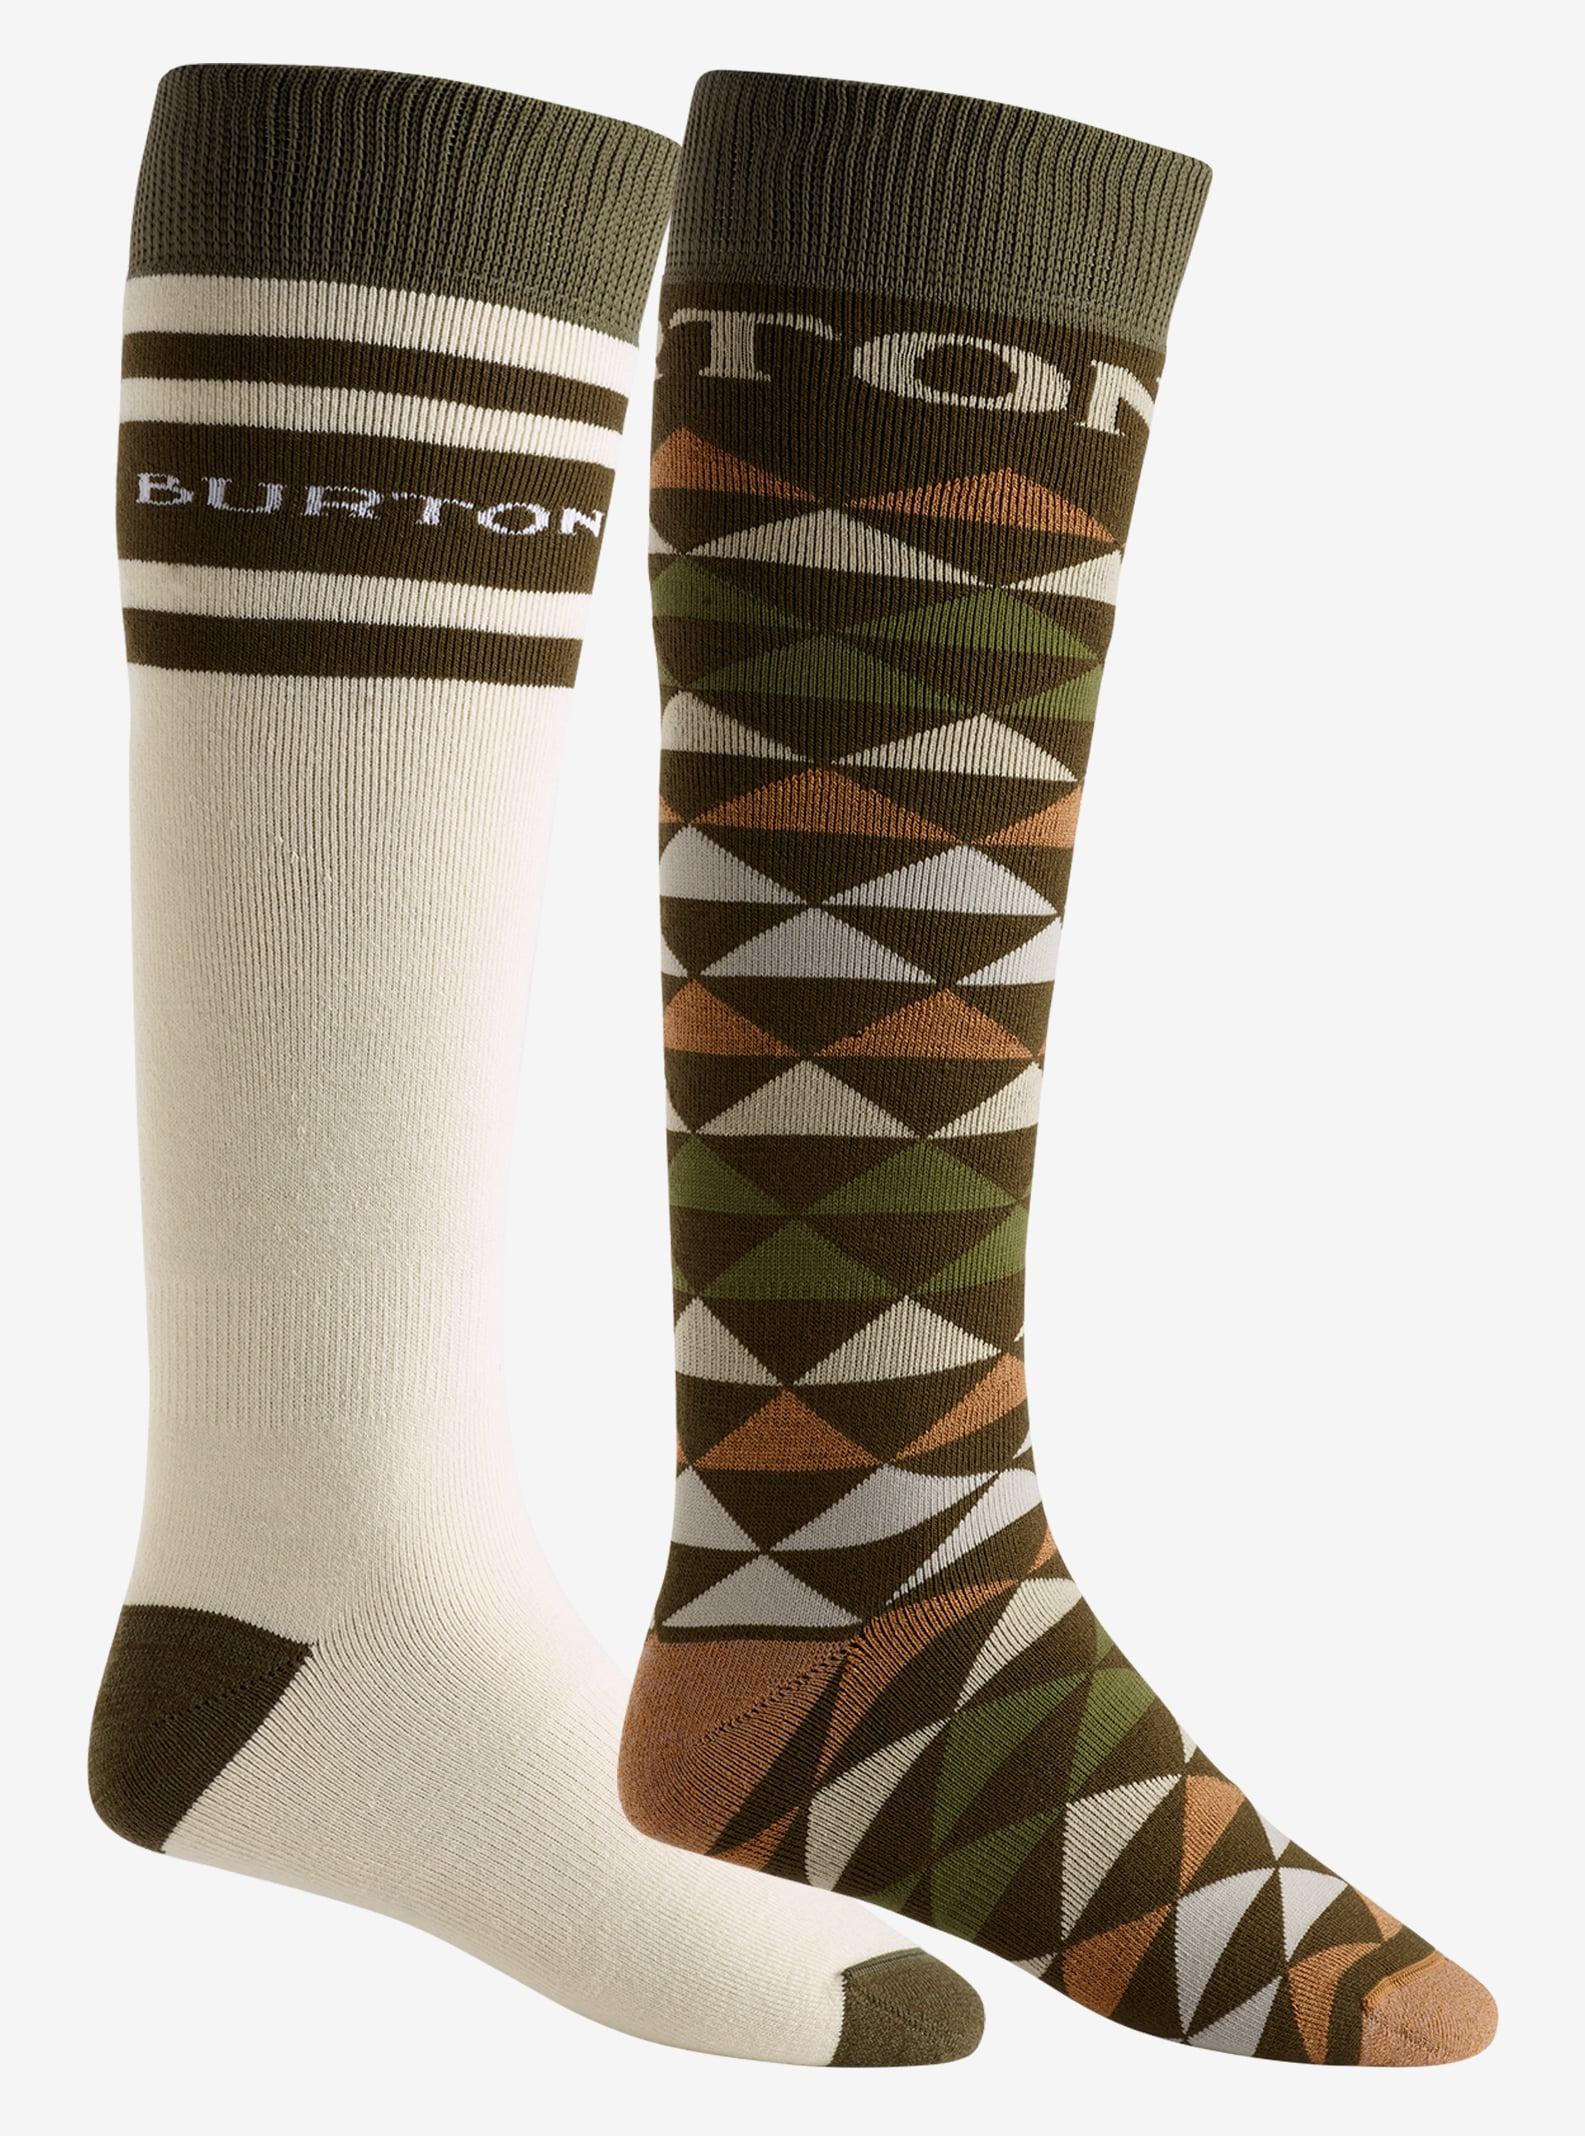 Men's Burton Weekend Sock 2 Pack shown in Forest Night